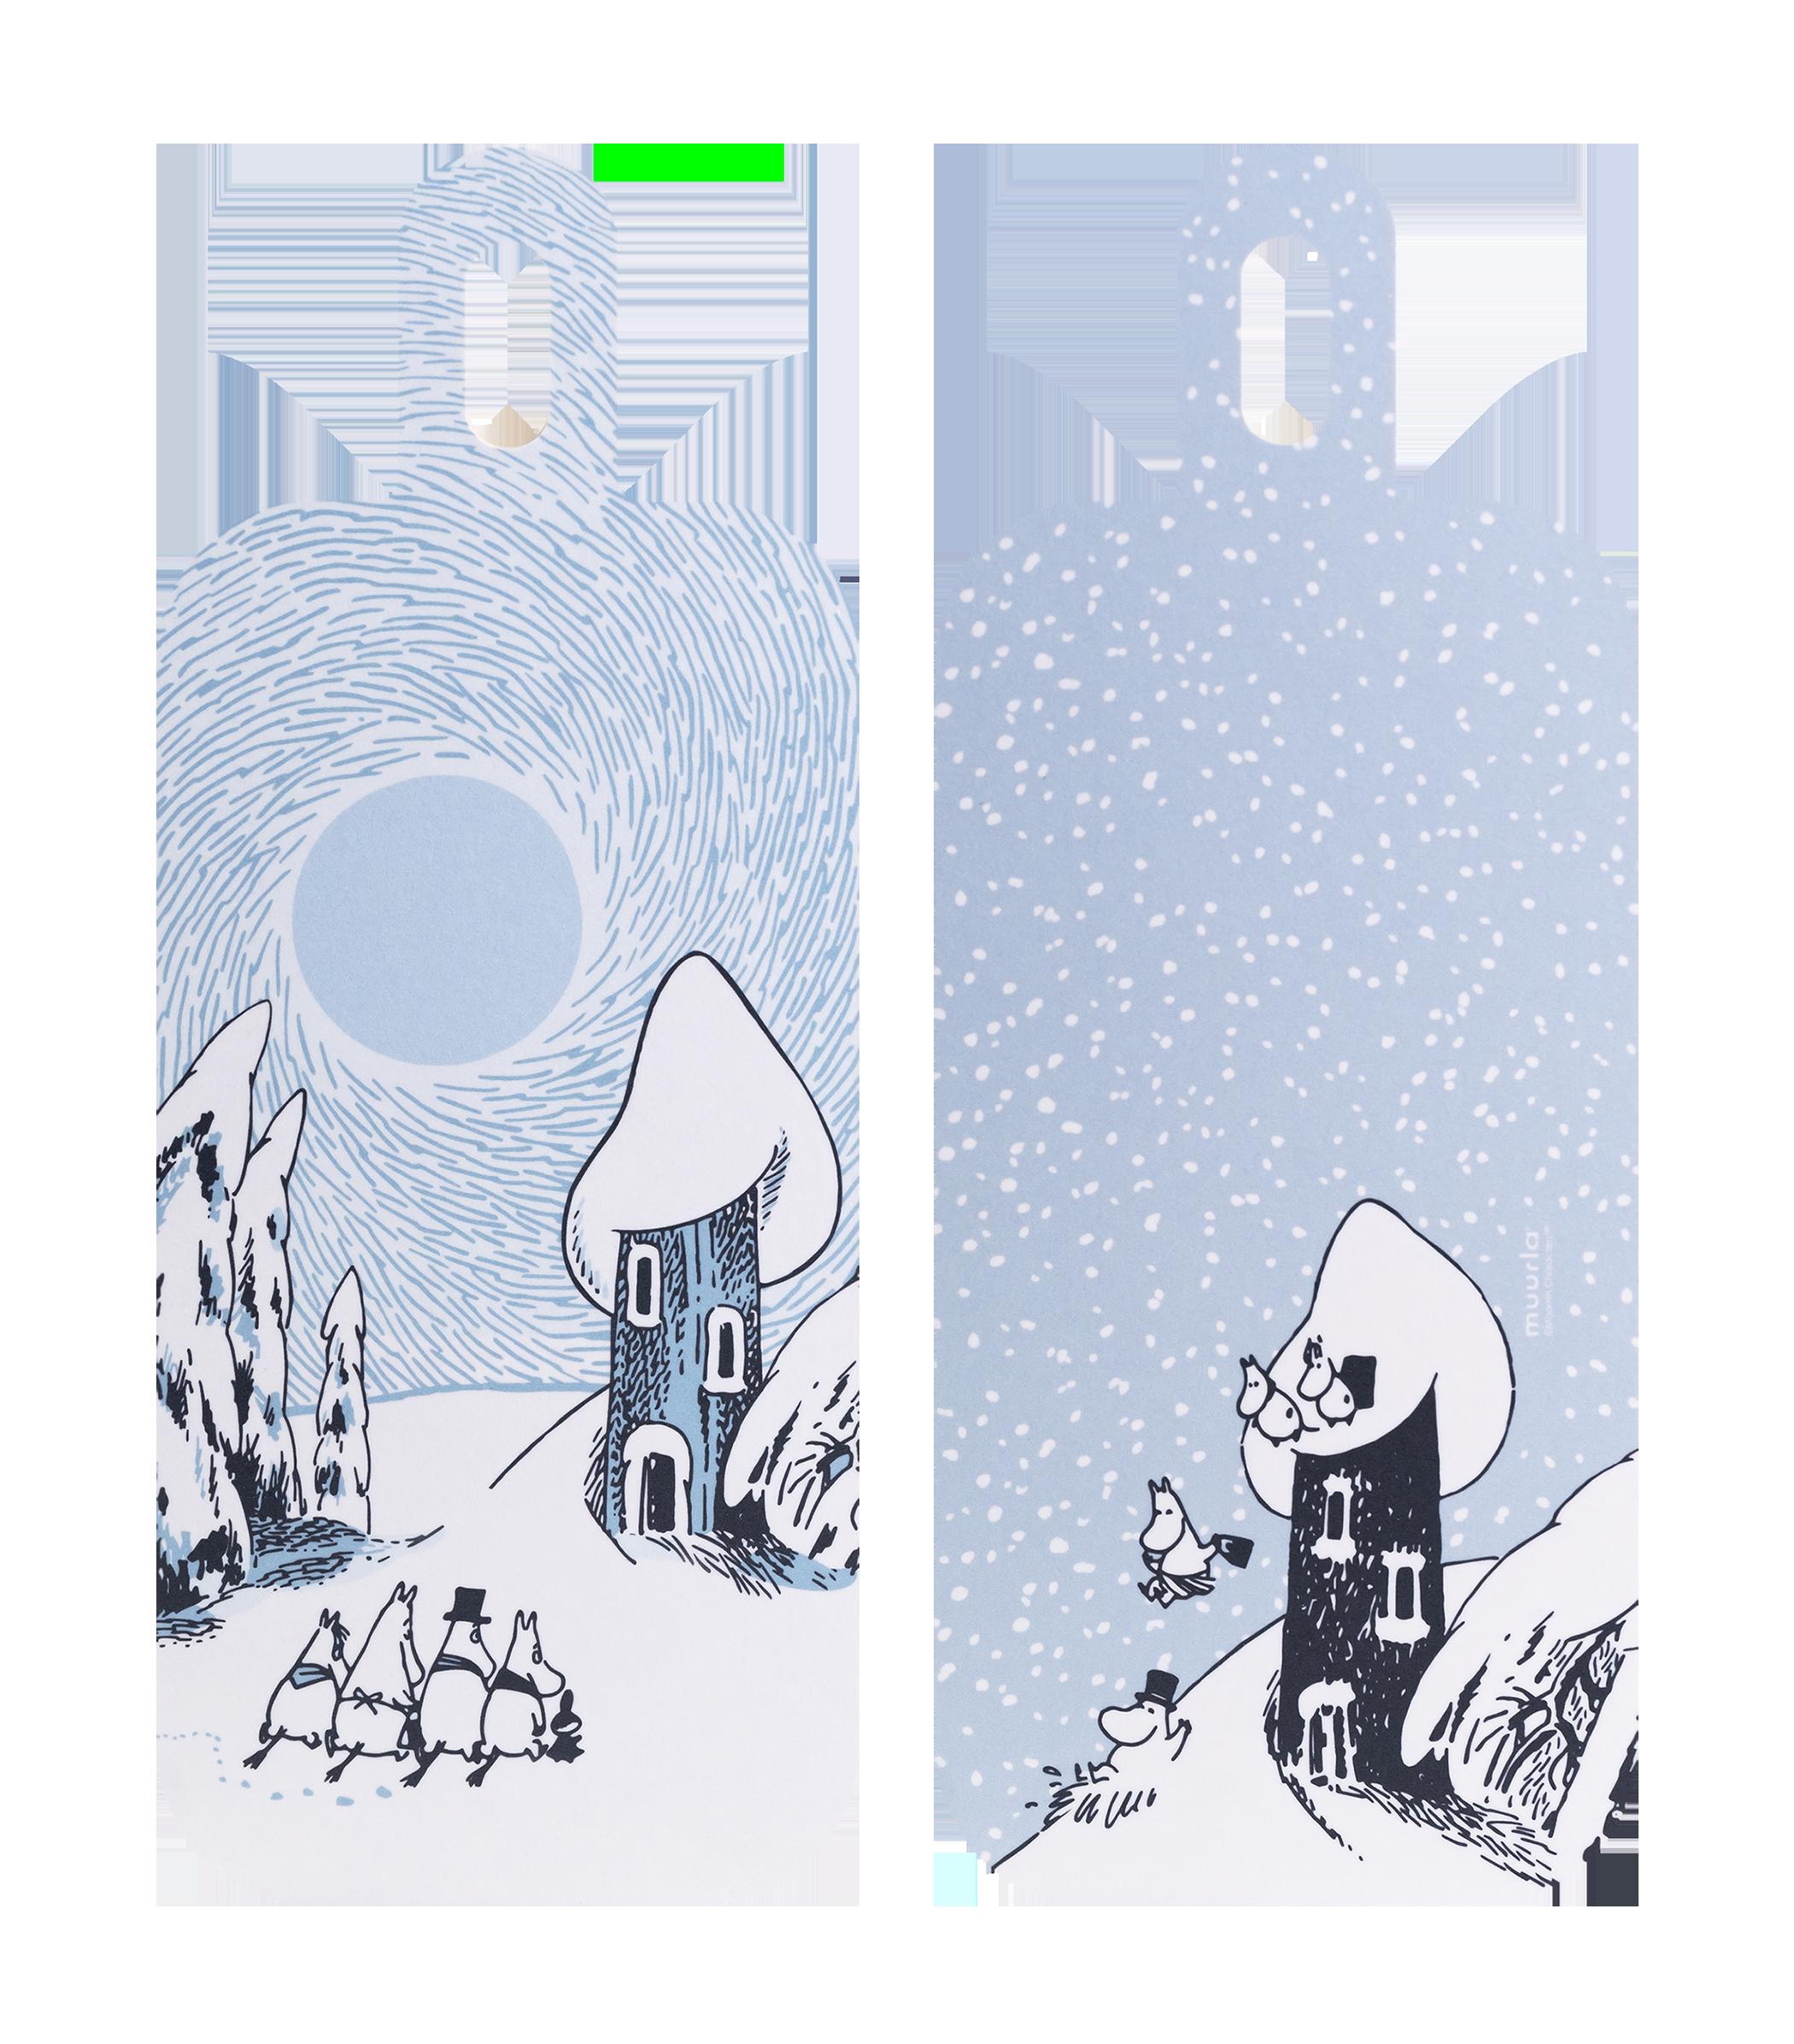 Moomin by Muurla - Snowy valley - Chop & Serve board 13x13 cm